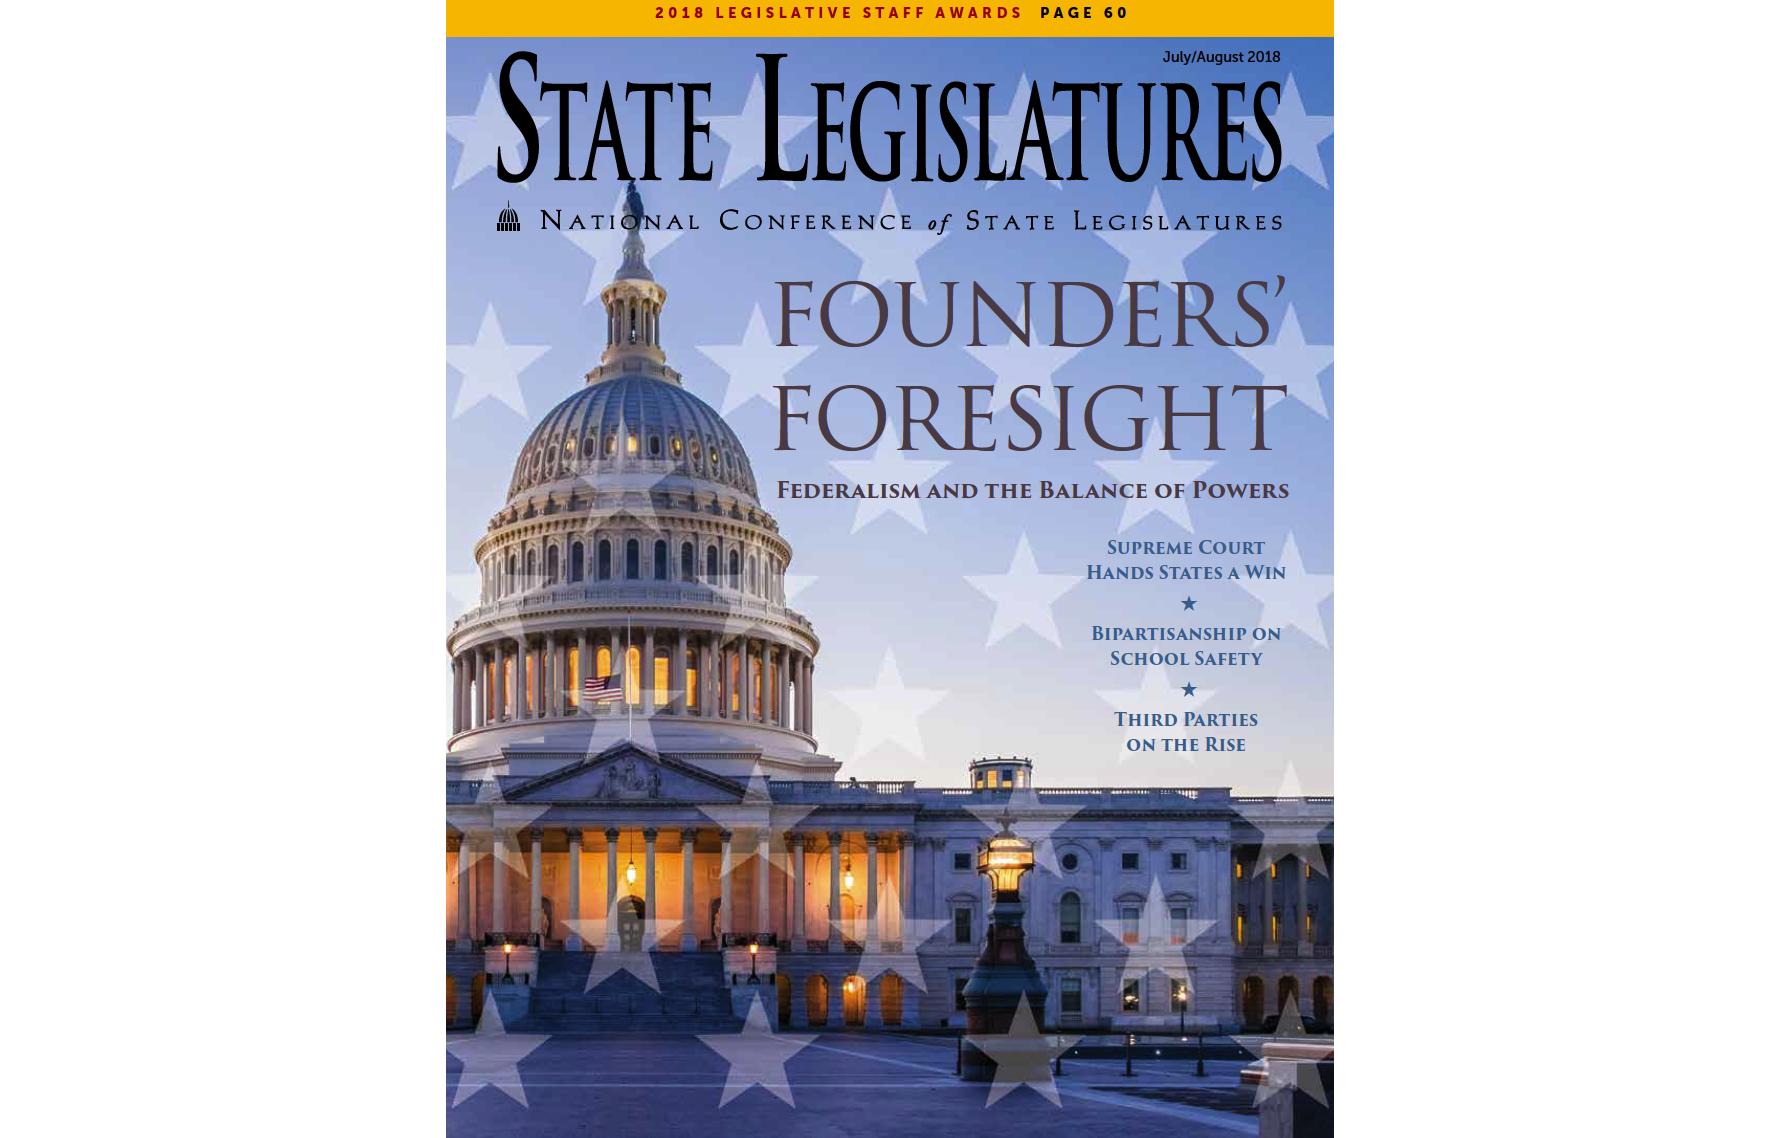 State Legislatures July 2018